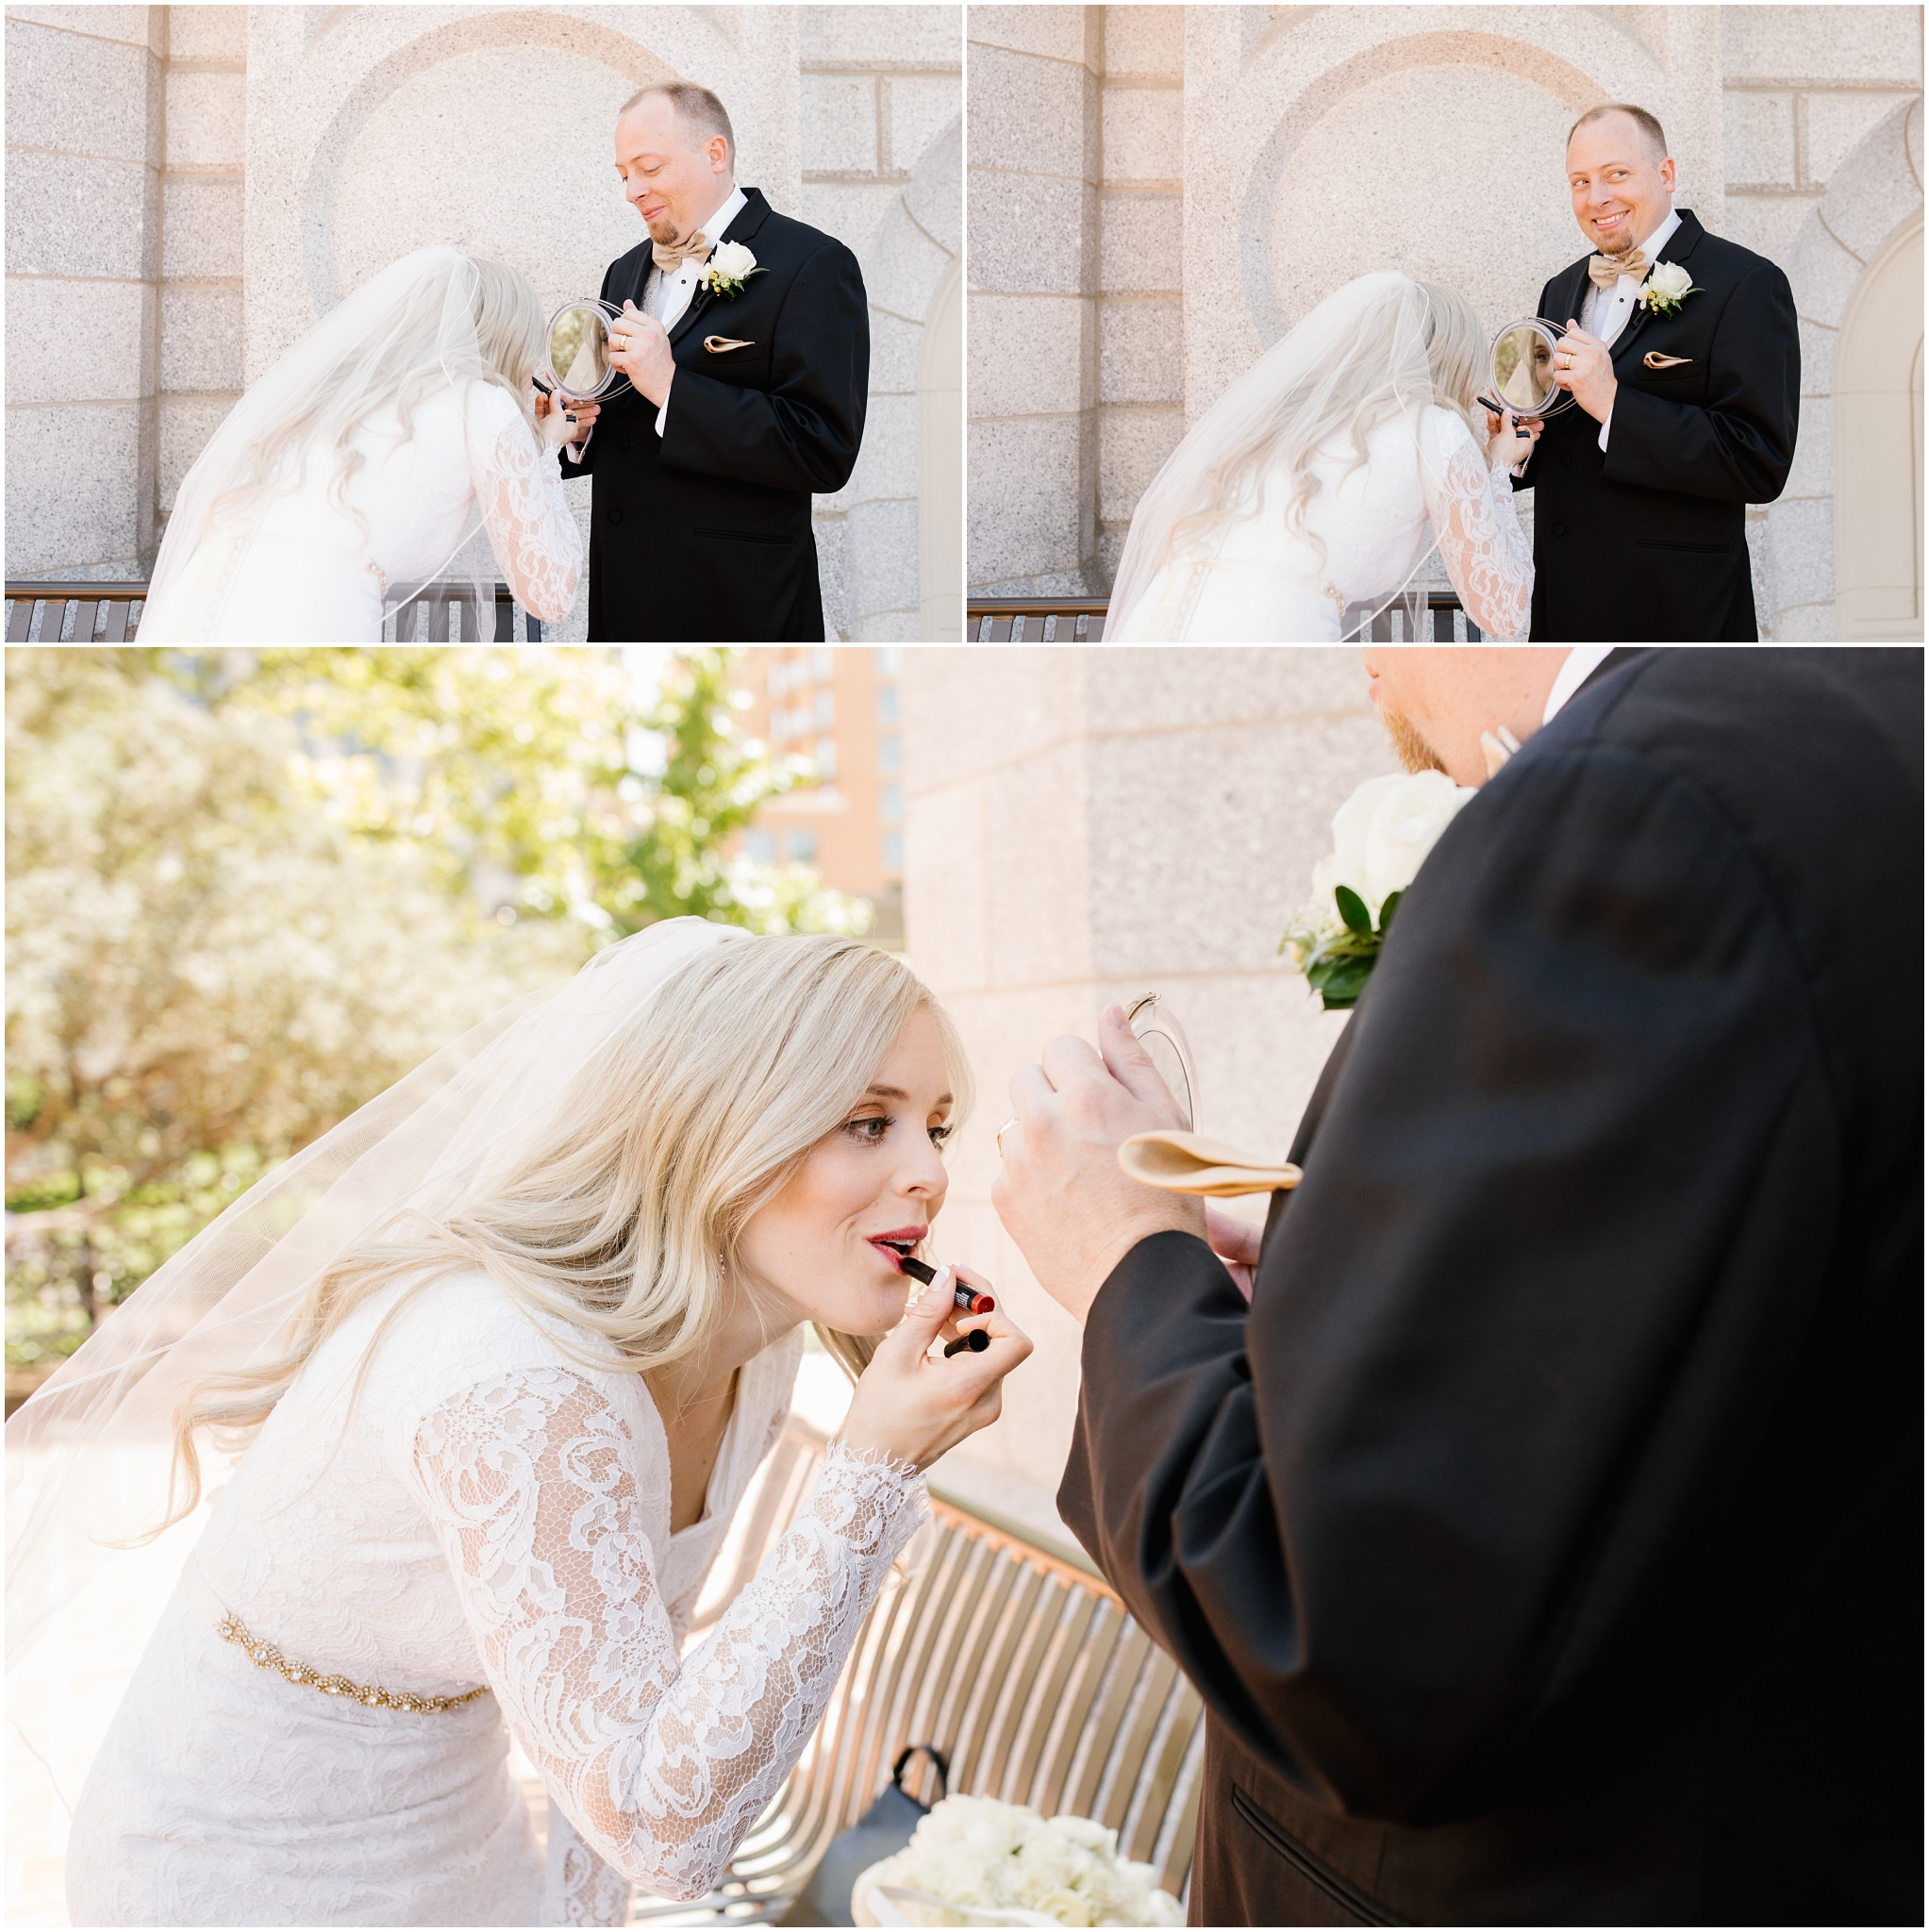 CherylandTyler-163_Lizzie-B-Imagery-Utah-Wedding-Photographer-Salt-Lake-City-Temple-Wells-Fargo-Building-Reception.jpg